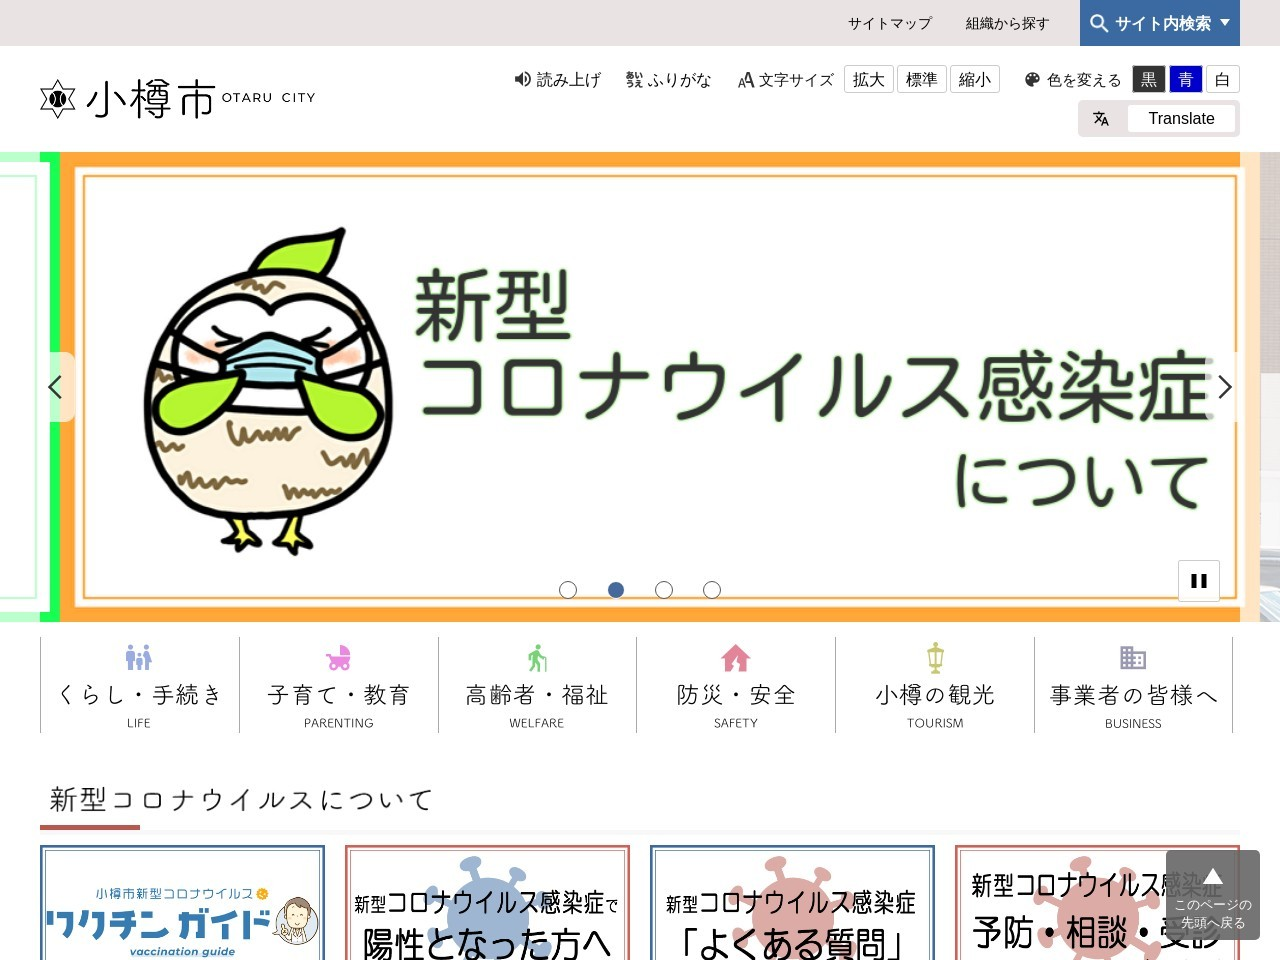 https://www.city.otaru.lg.jp/simin/gakushu_sports/bunka/artist_bank/artist_itiran/sonota/saiseifo-ramu.html